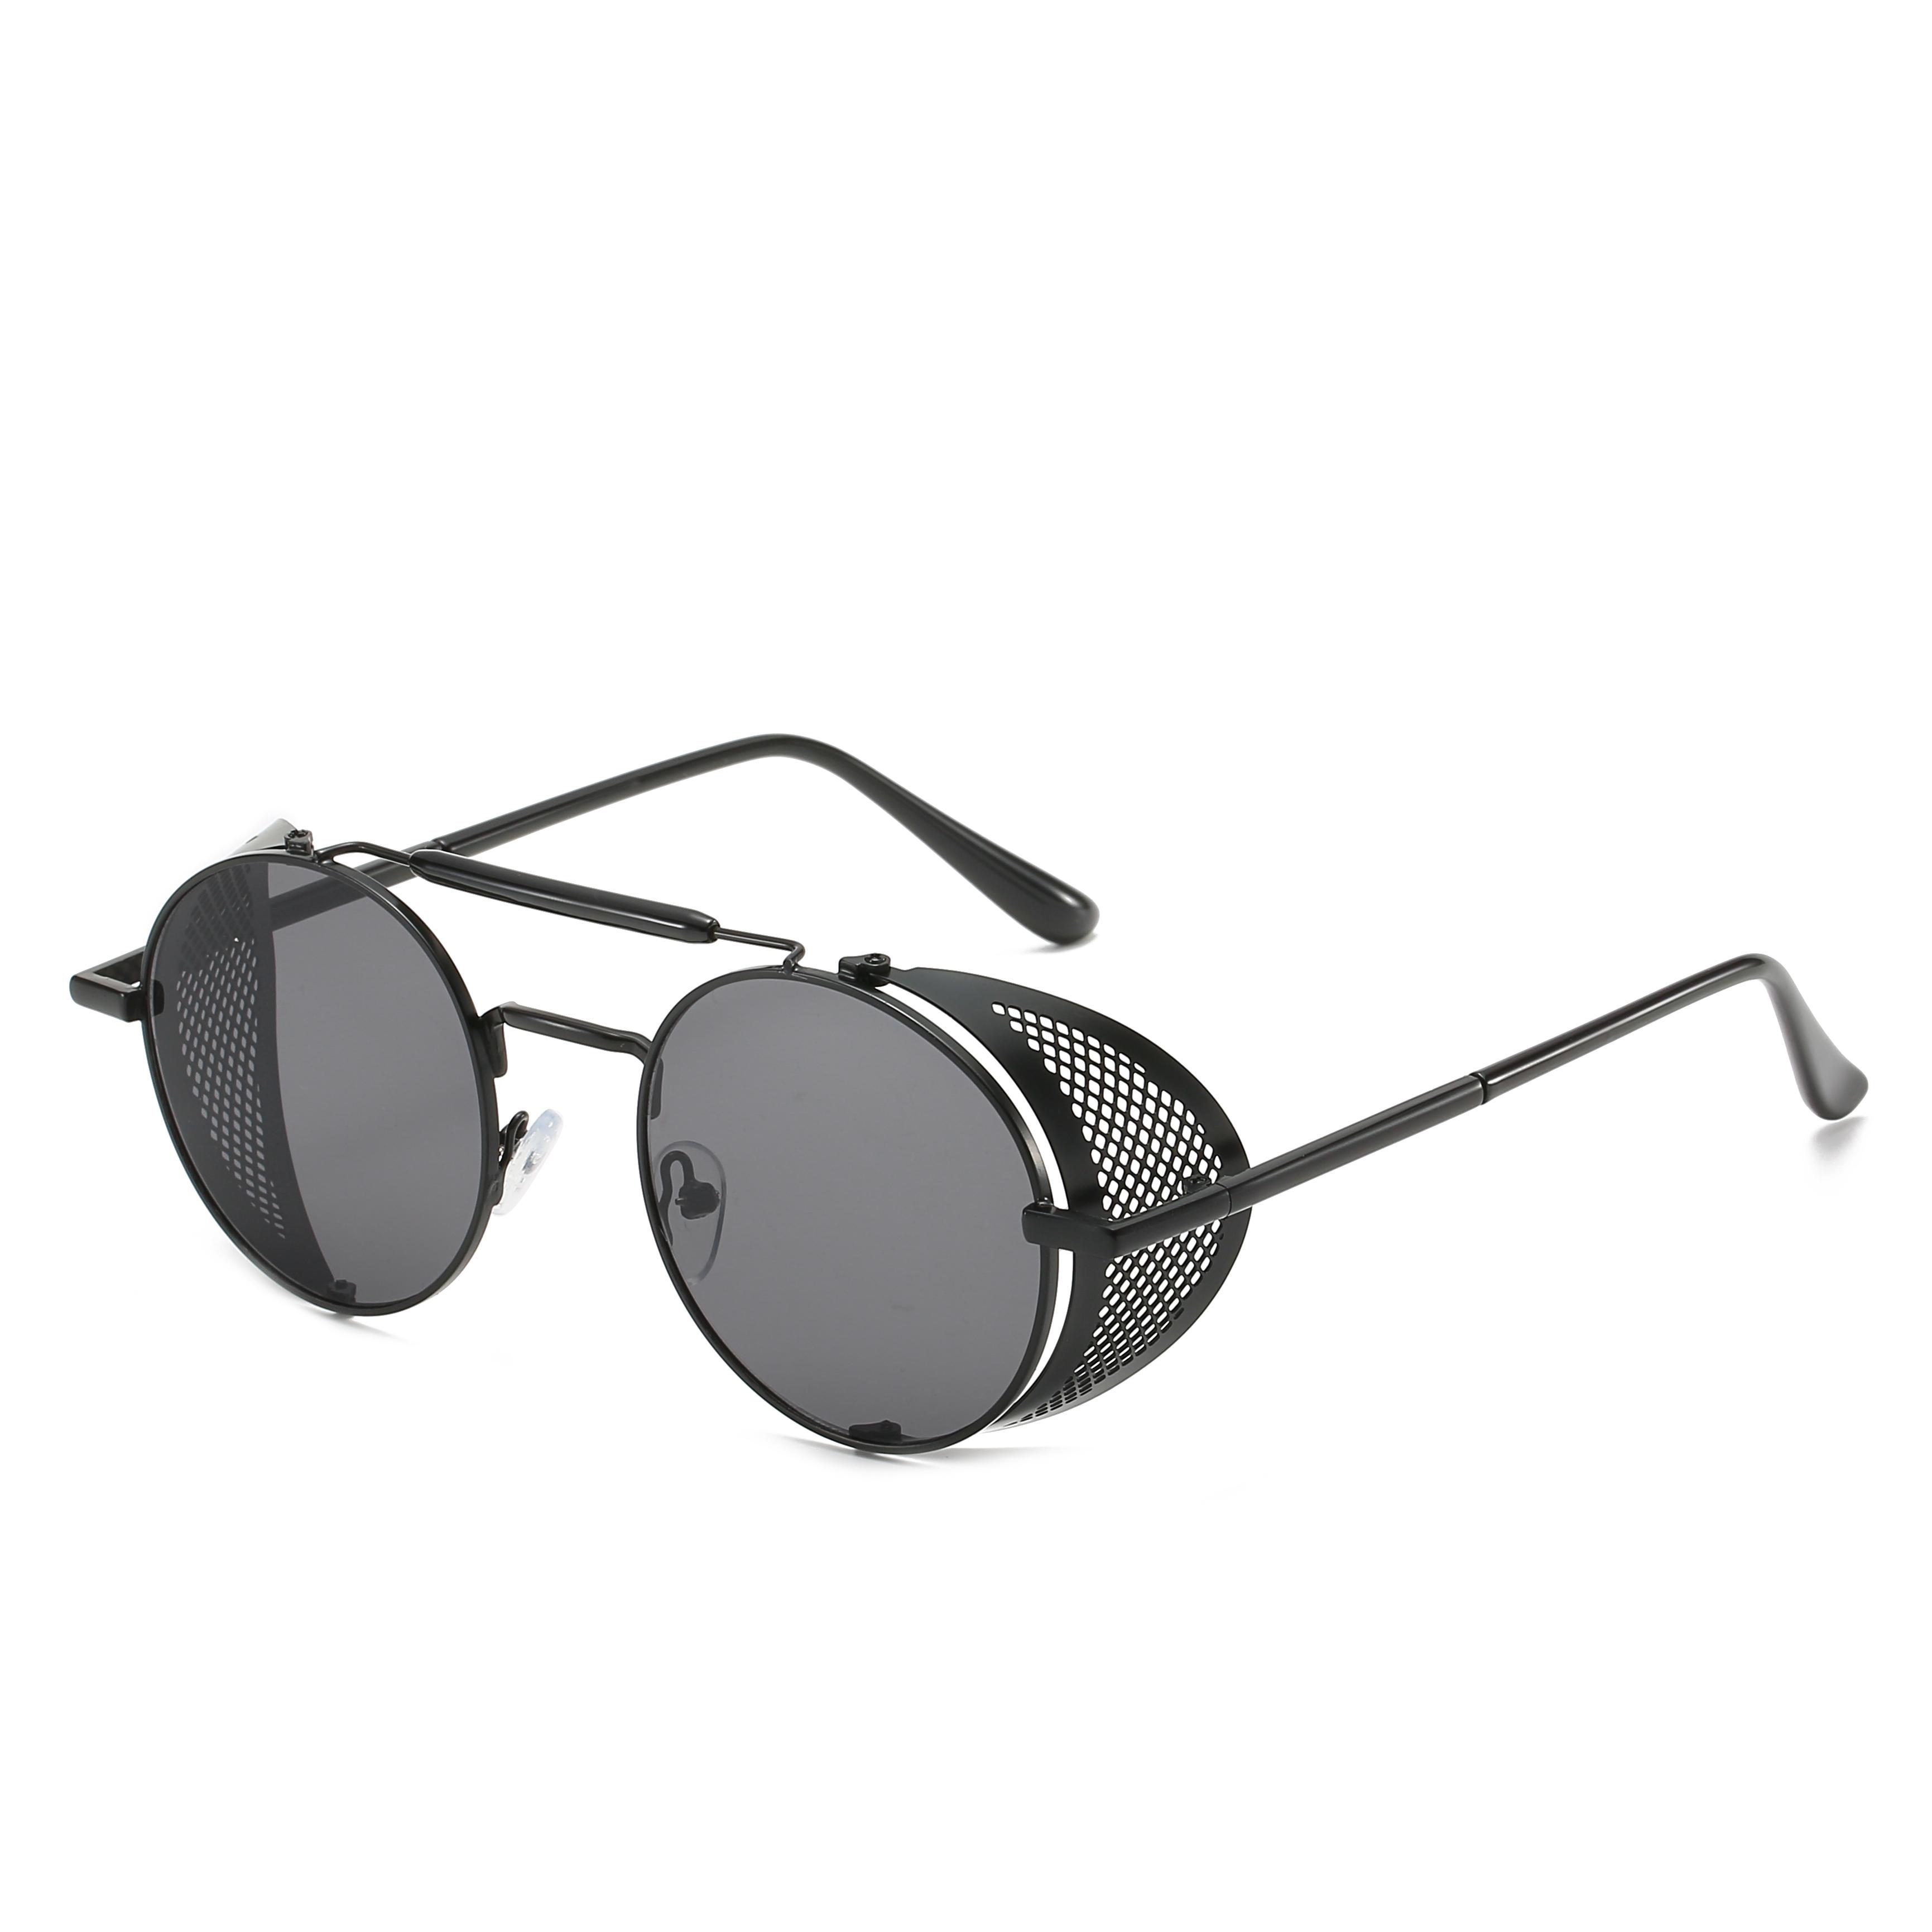 THREE HIPPOS 2020 New Arrivals Sunglasses Man Shades Unique Custom Logo Sun Glasses Fashion Sunglasses UV400 Unisex Black GOLD